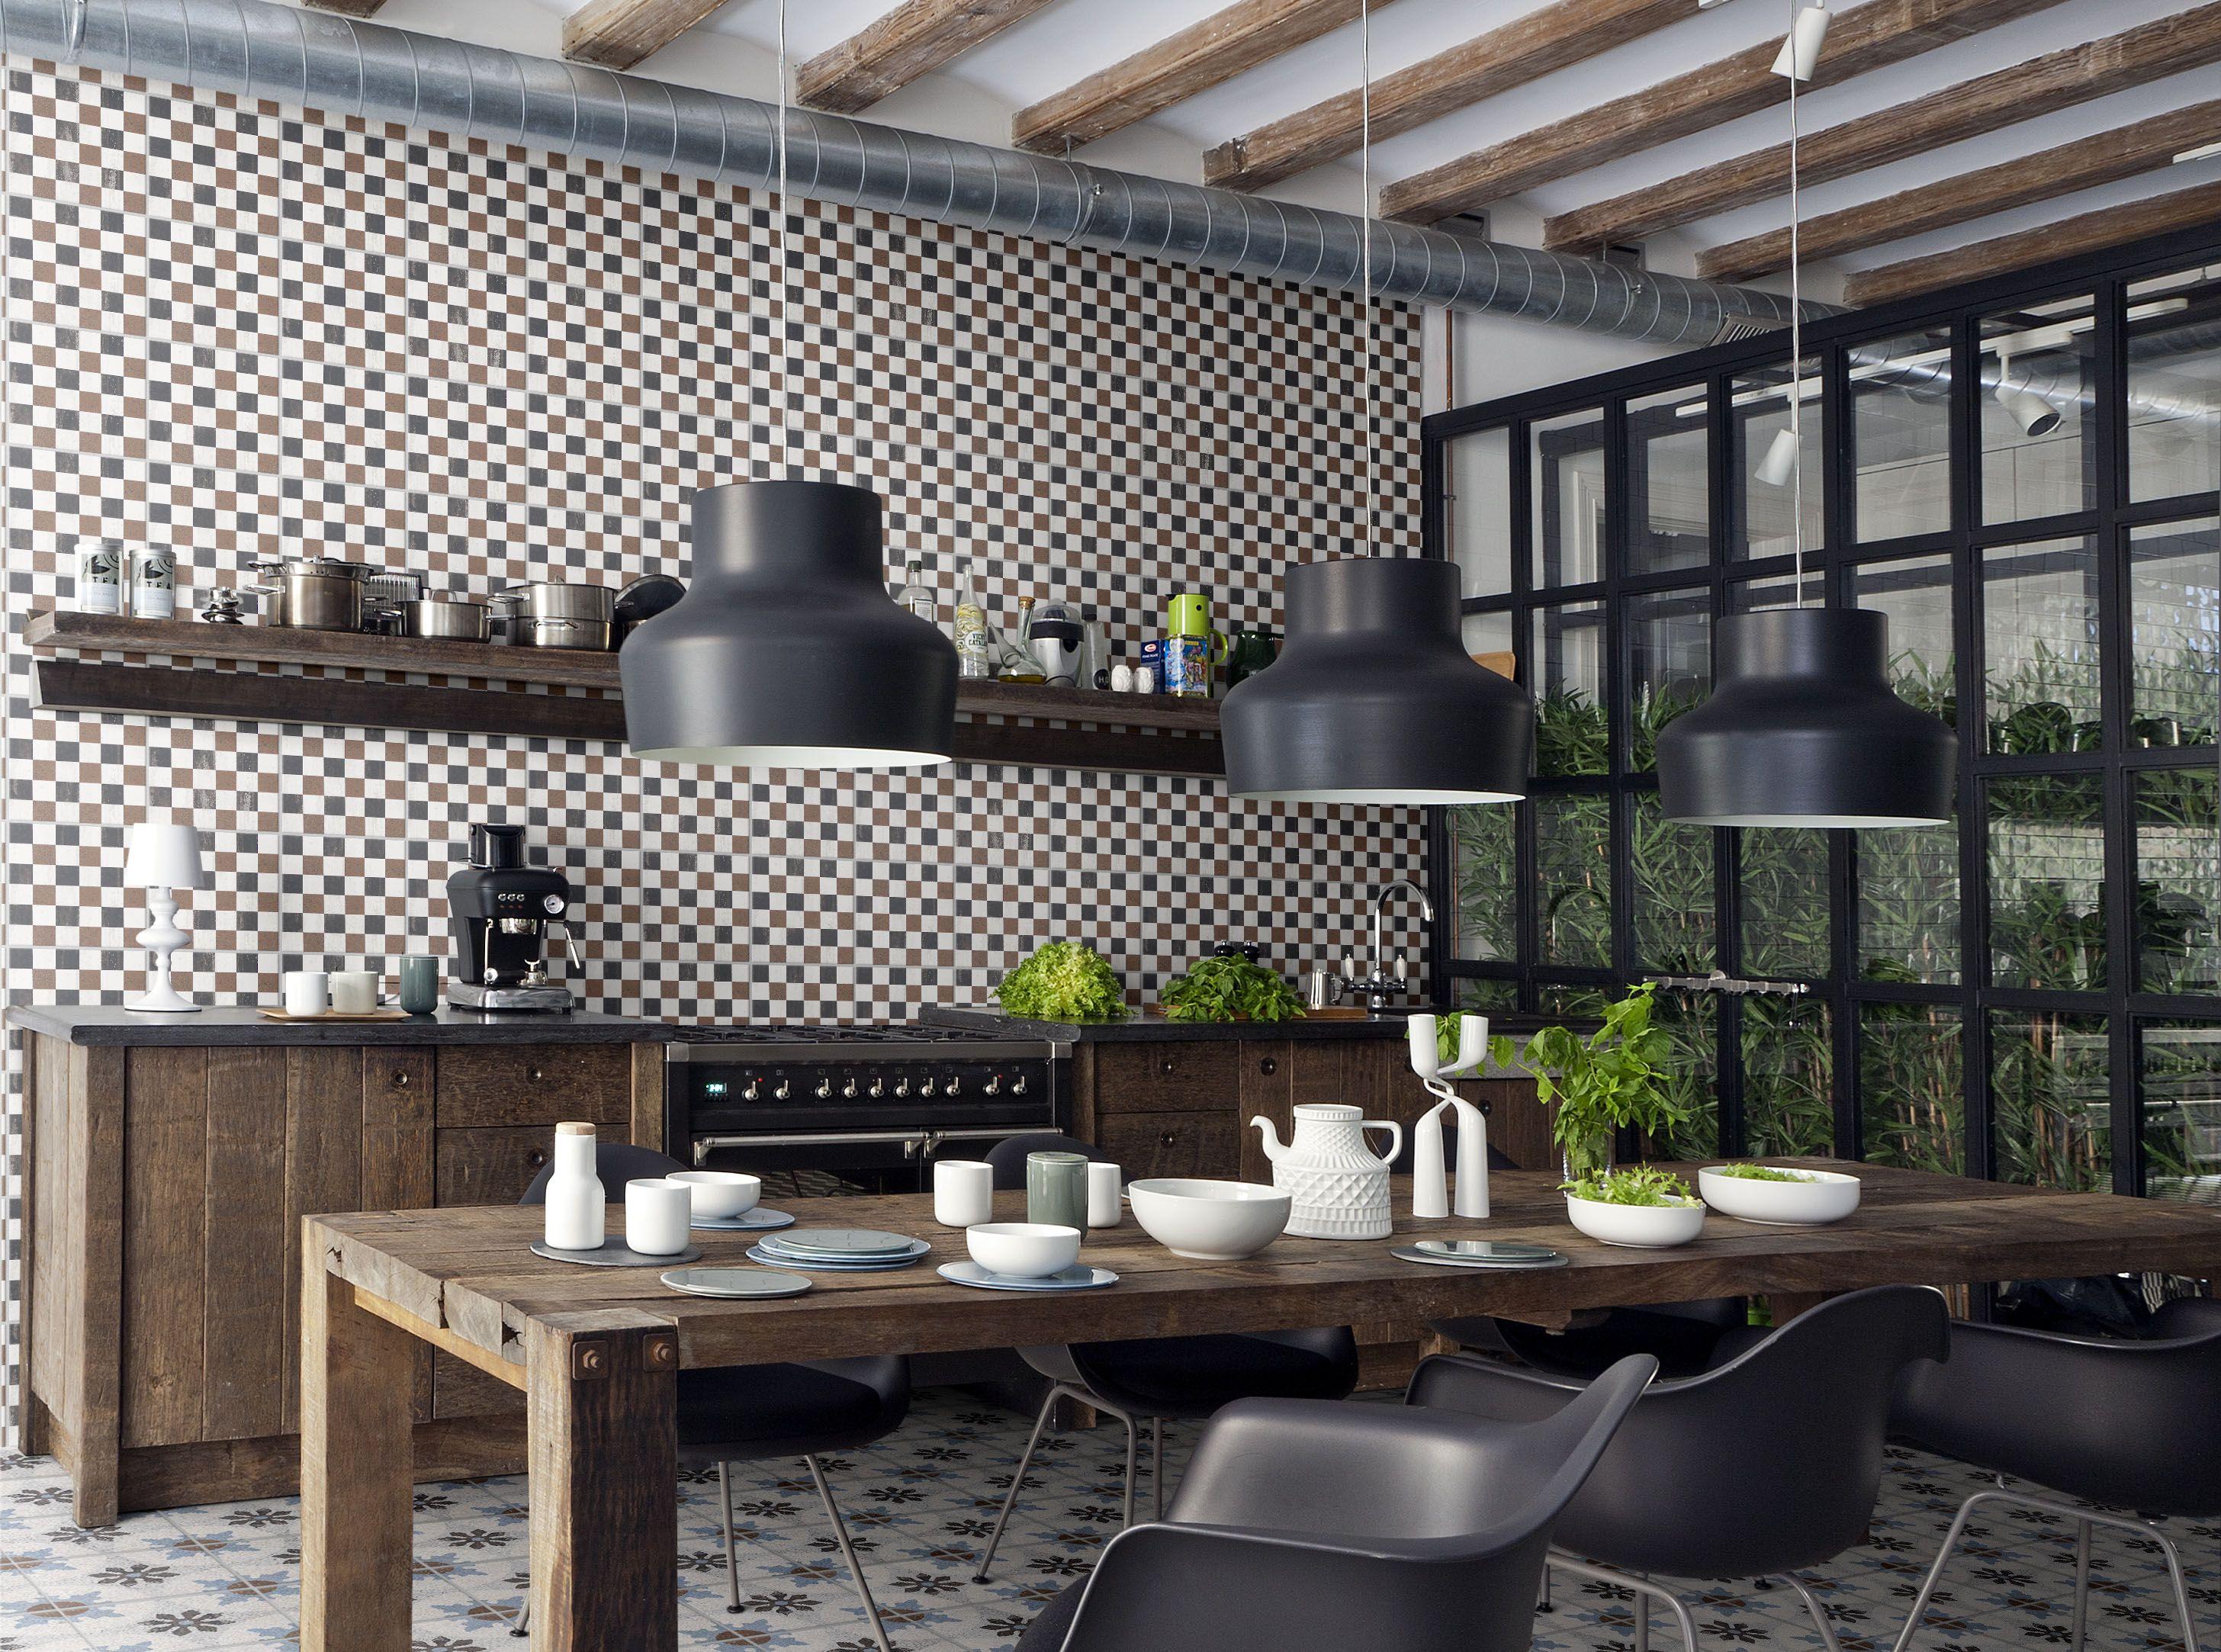 Decoration Modern Industrial Kitchen Cemetine Porcelain Tile Wall